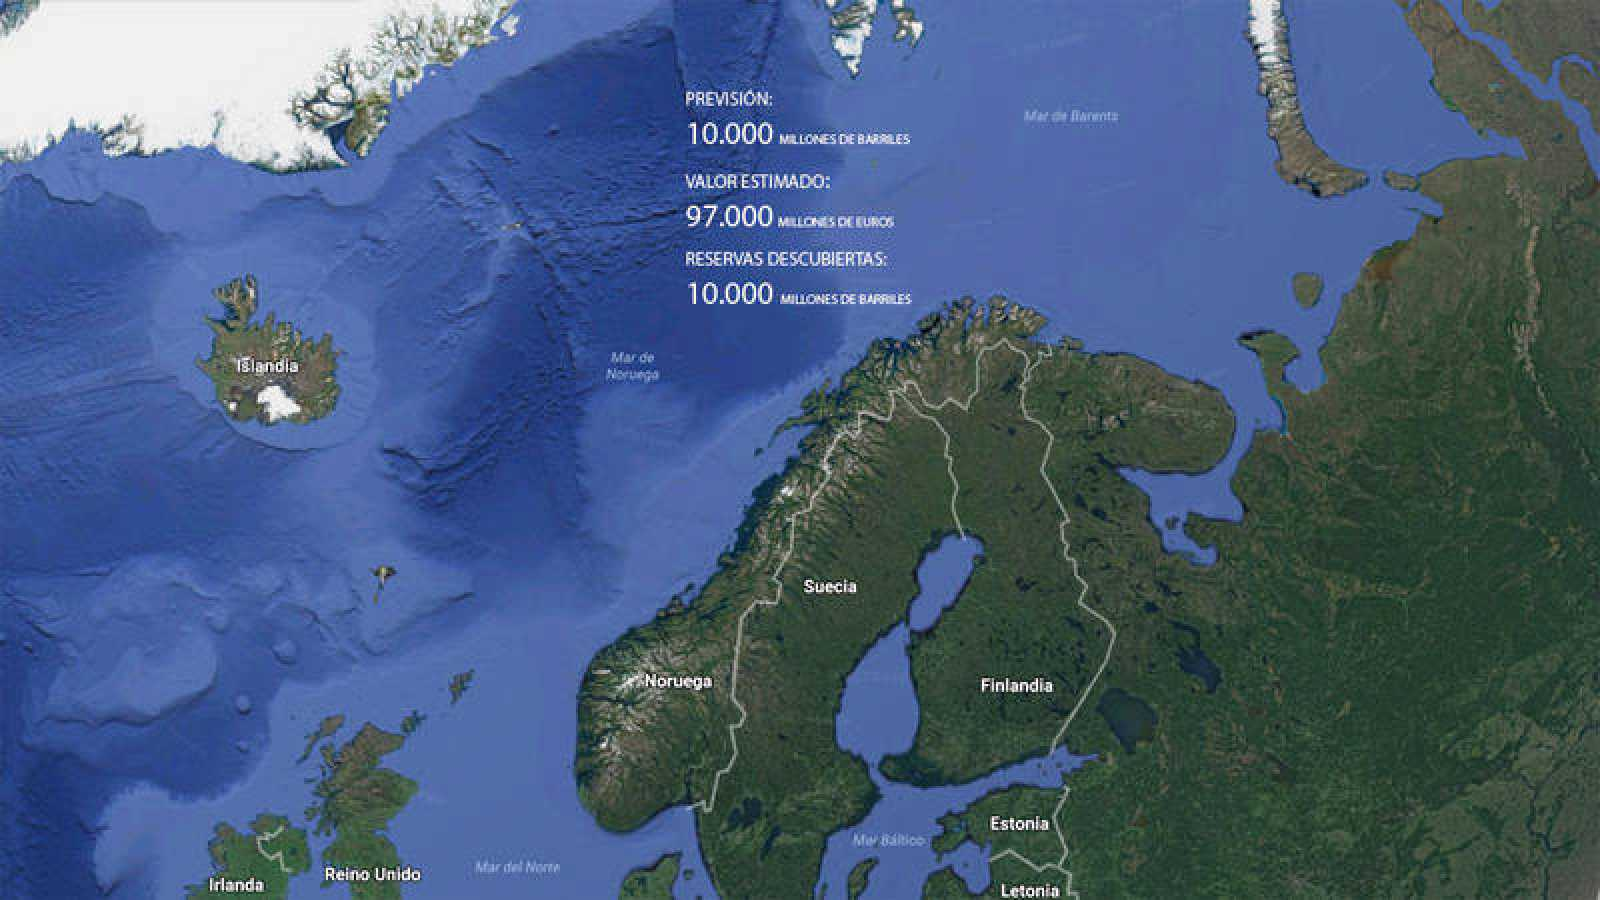 Noruega duplica sus previsiones de petróleo en el mar de Barents